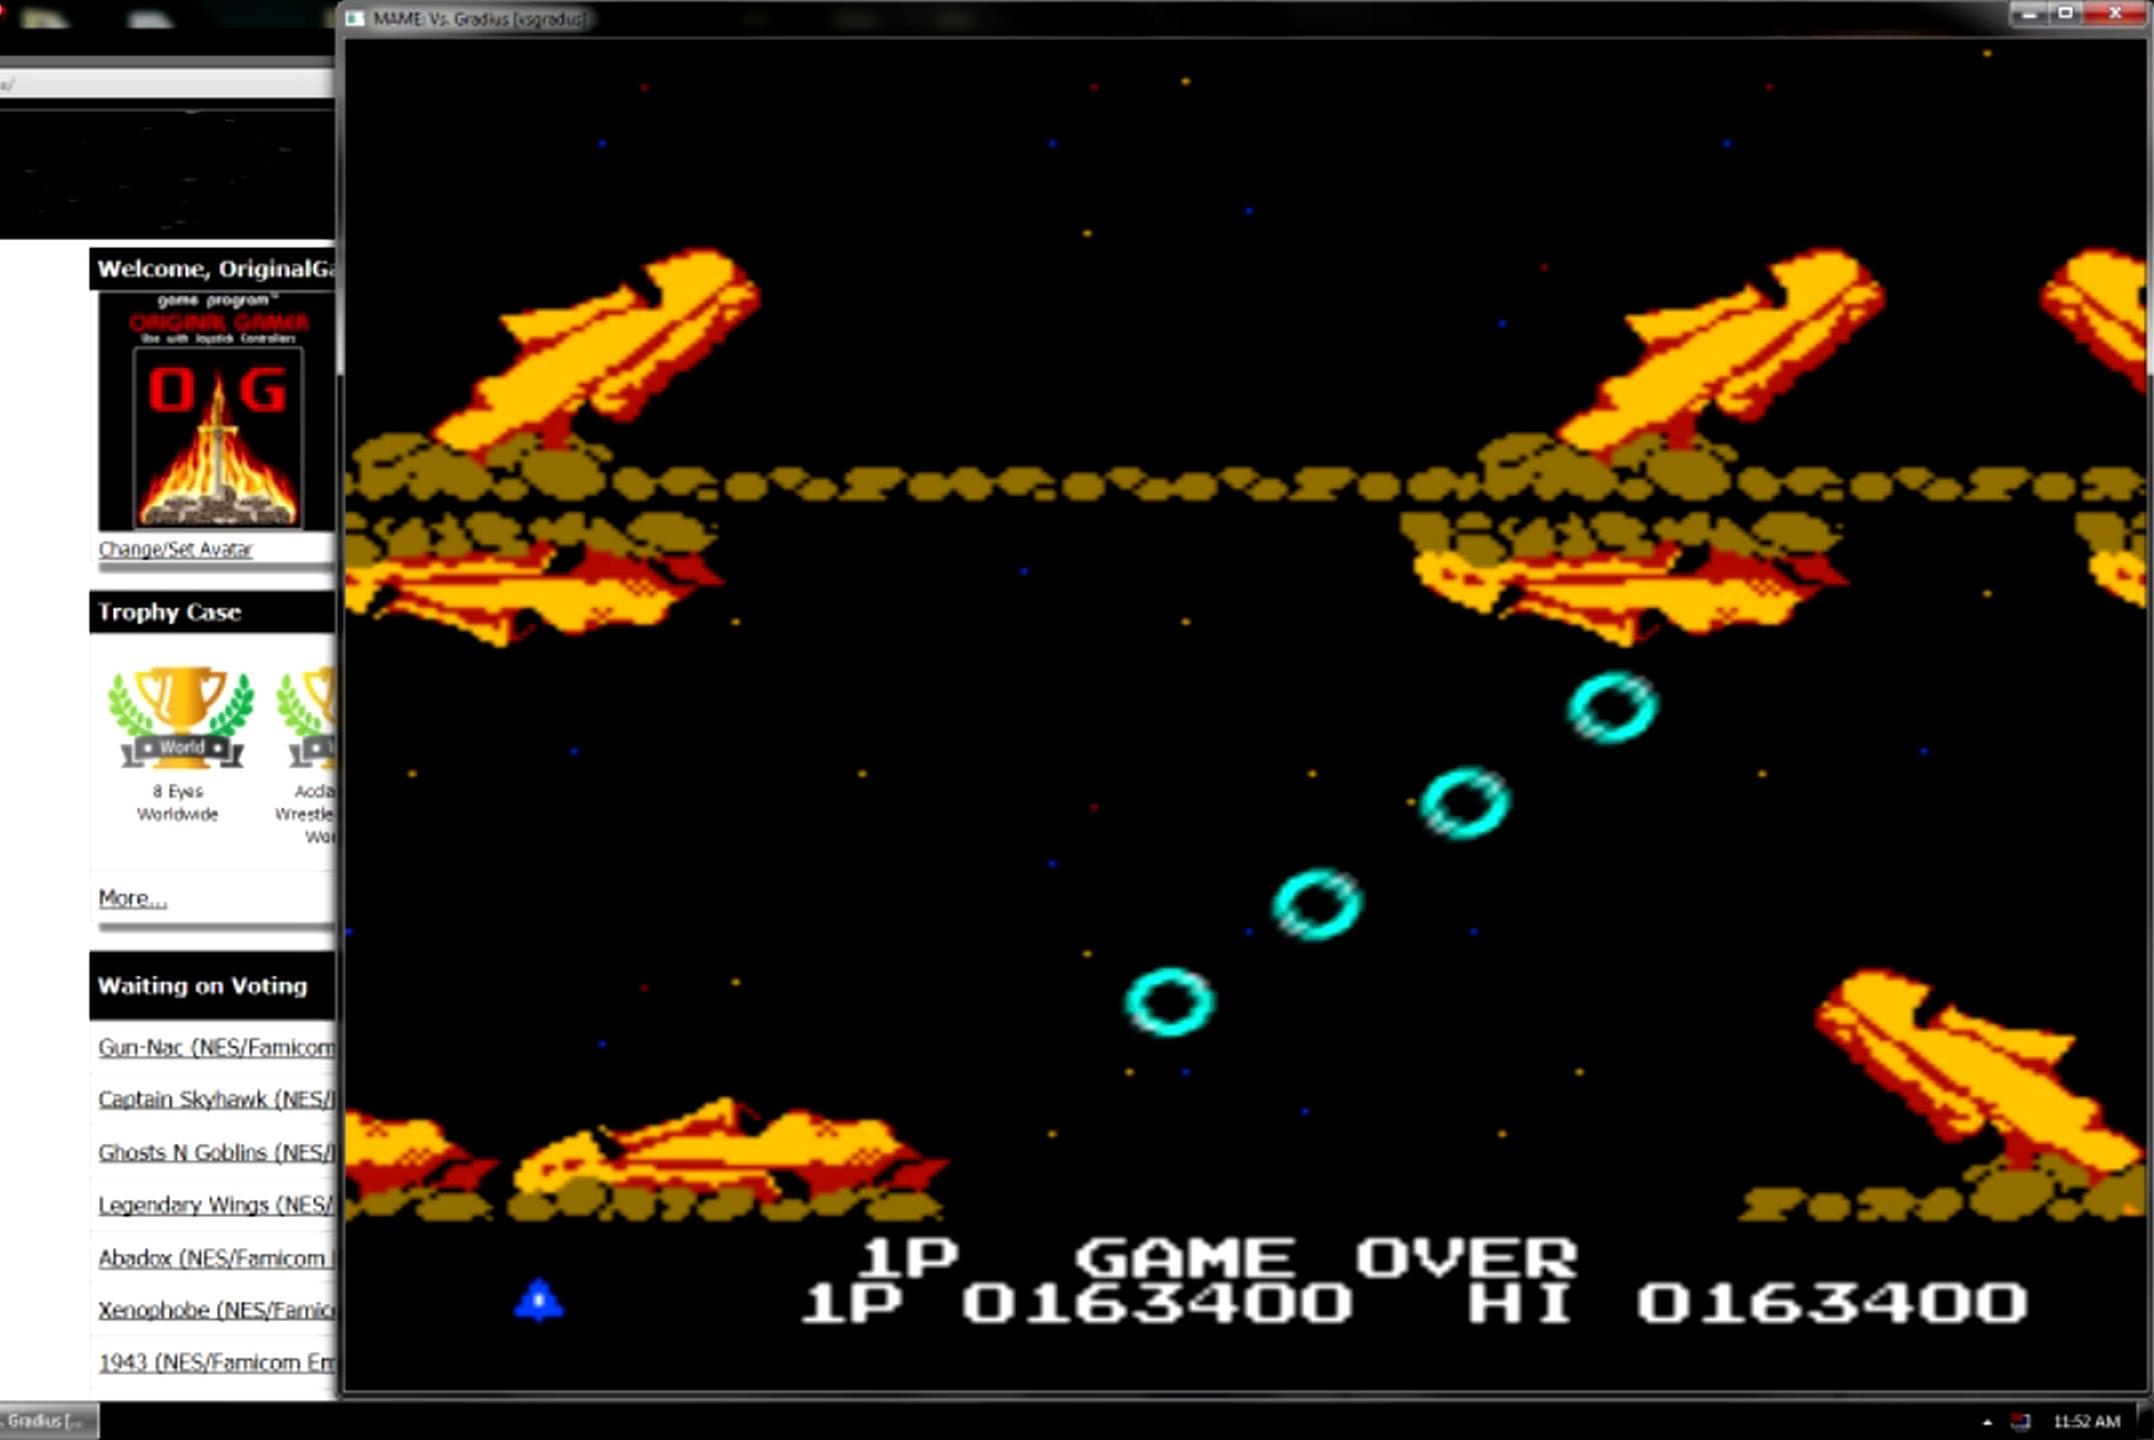 OriginalGamer: Vs. Gradius [vsgradus] (Arcade Emulated / M.A.M.E.) 163,400 points on 2015-05-11 13:21:38